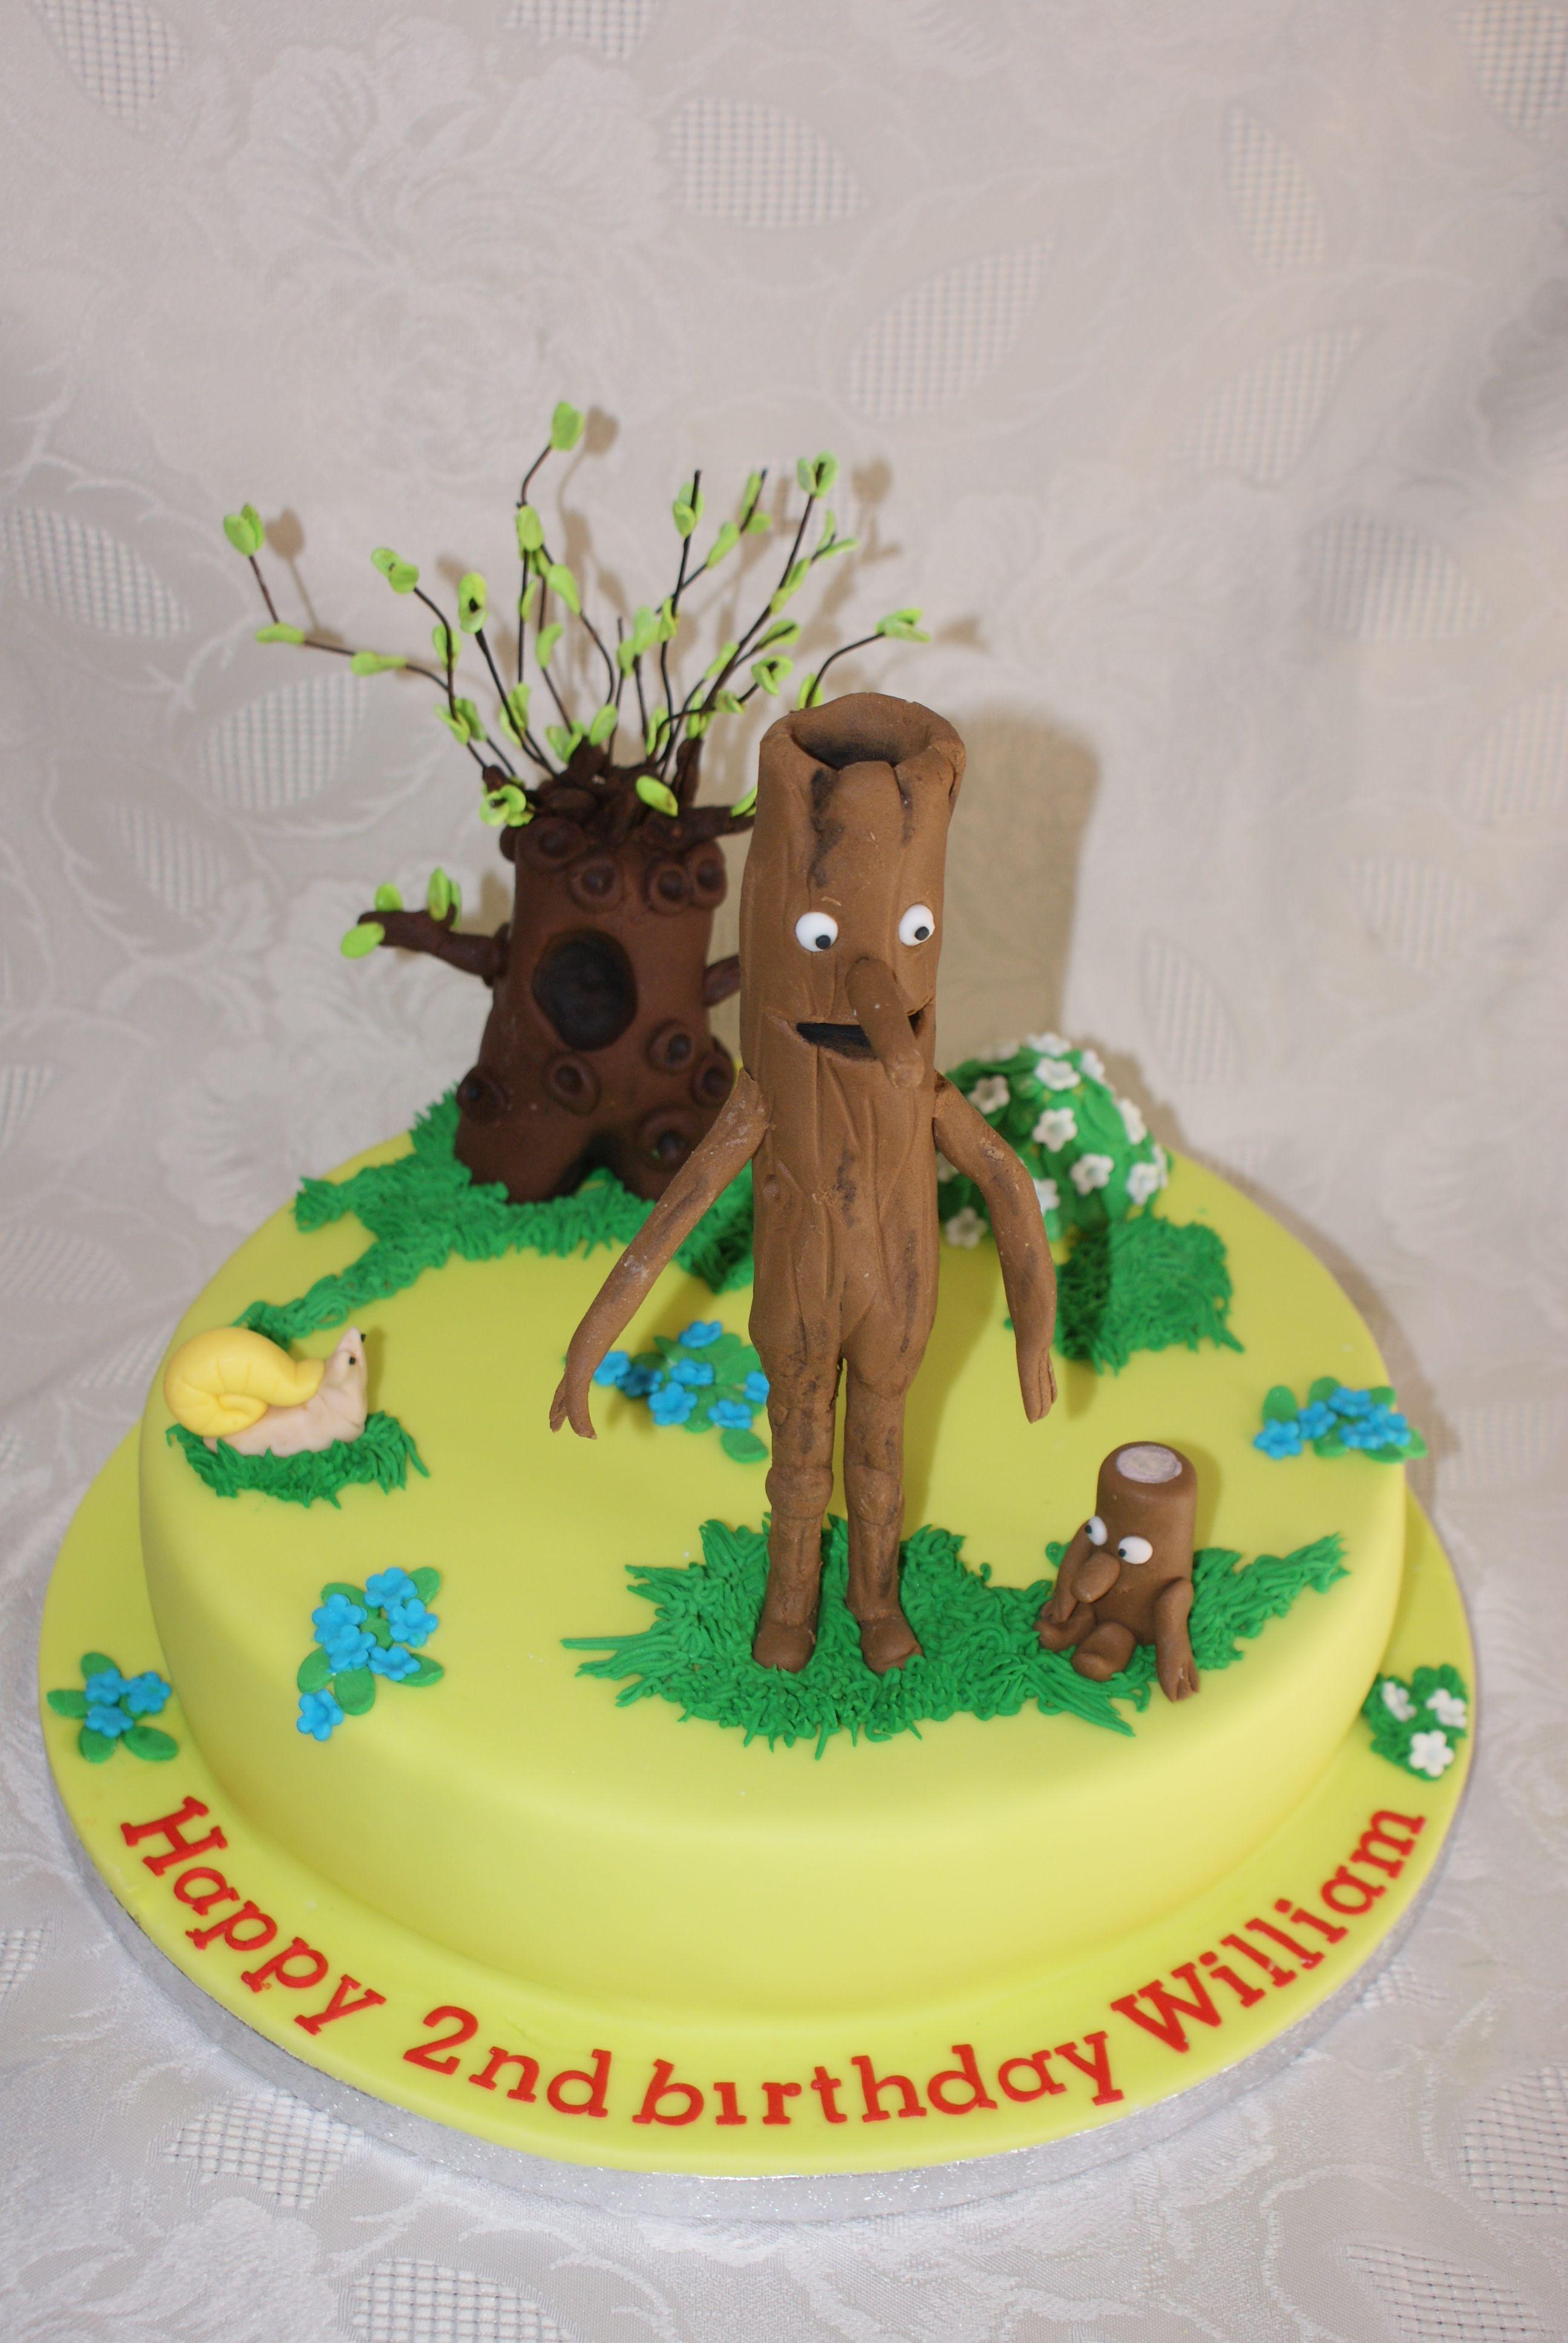 Stickman and the family tree cake | Etties birthday ideas ...